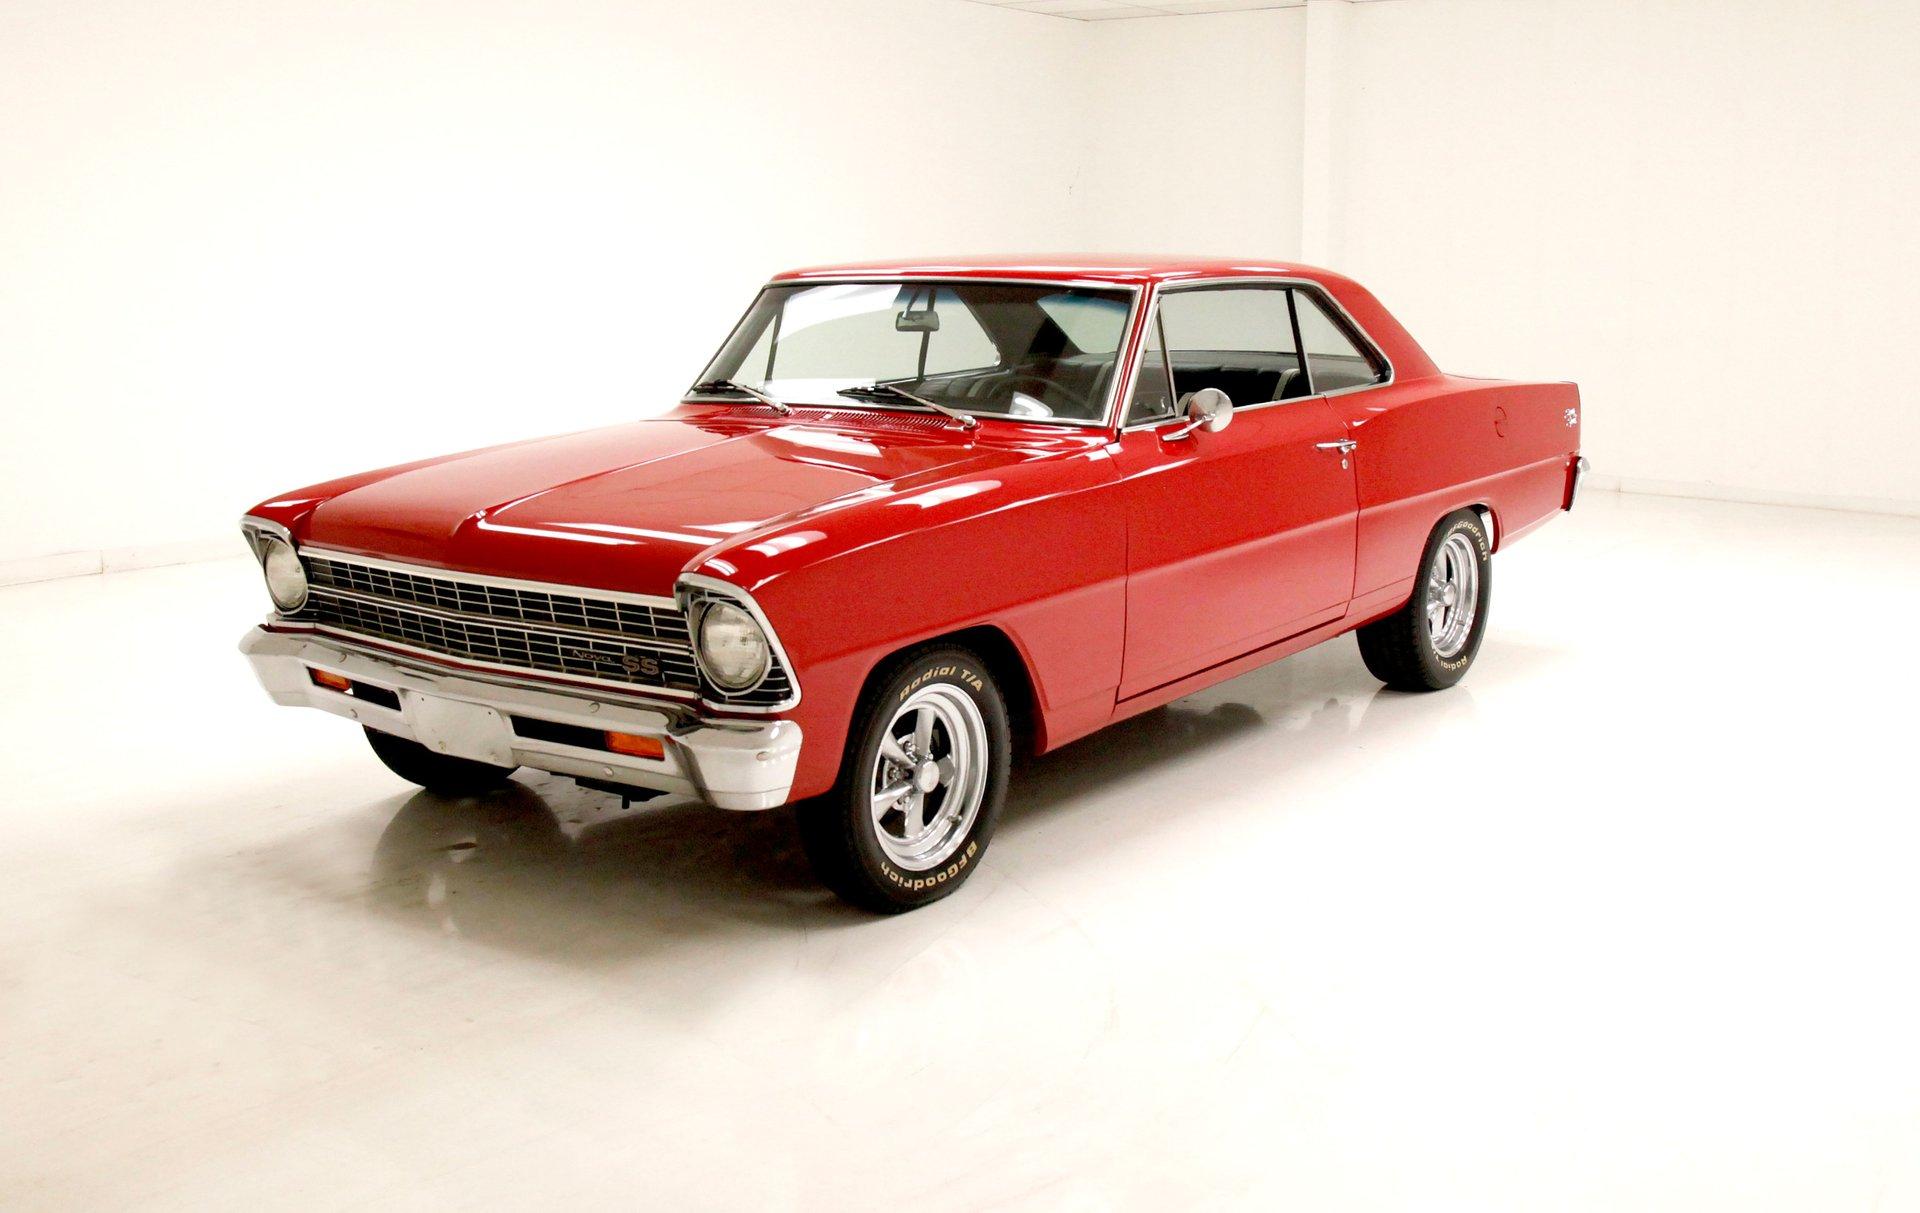 1967 Chevrolet Nova II SS